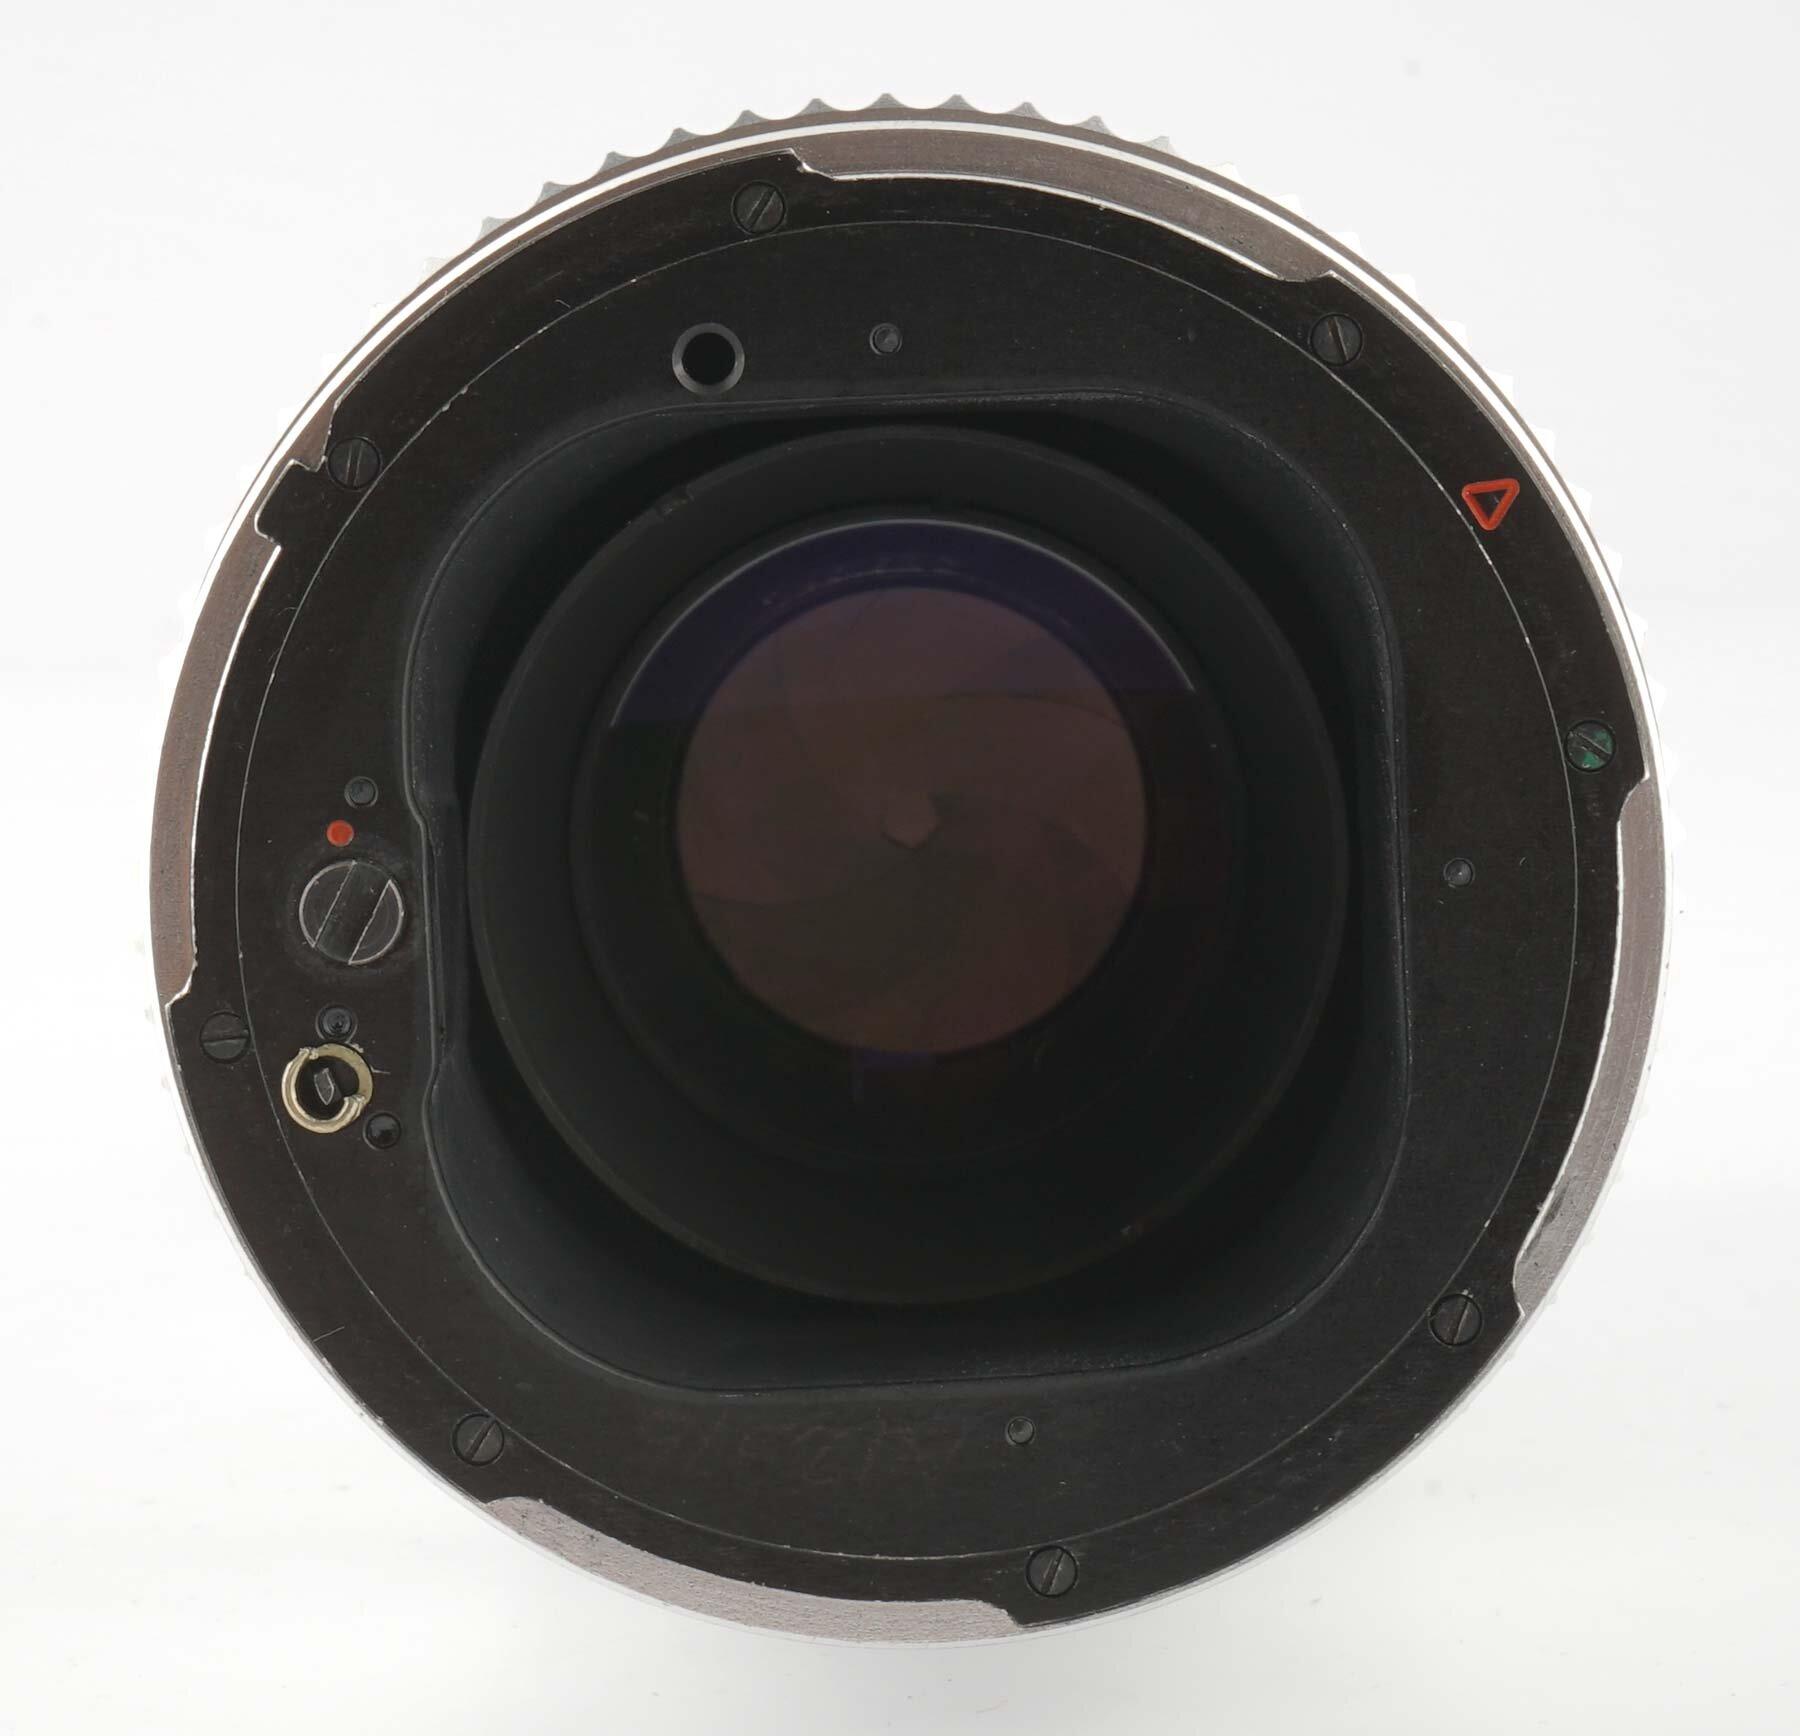 Carl Zeiss Sonnar 1:5,6/250mm Synchro-Compur Hasselblad V